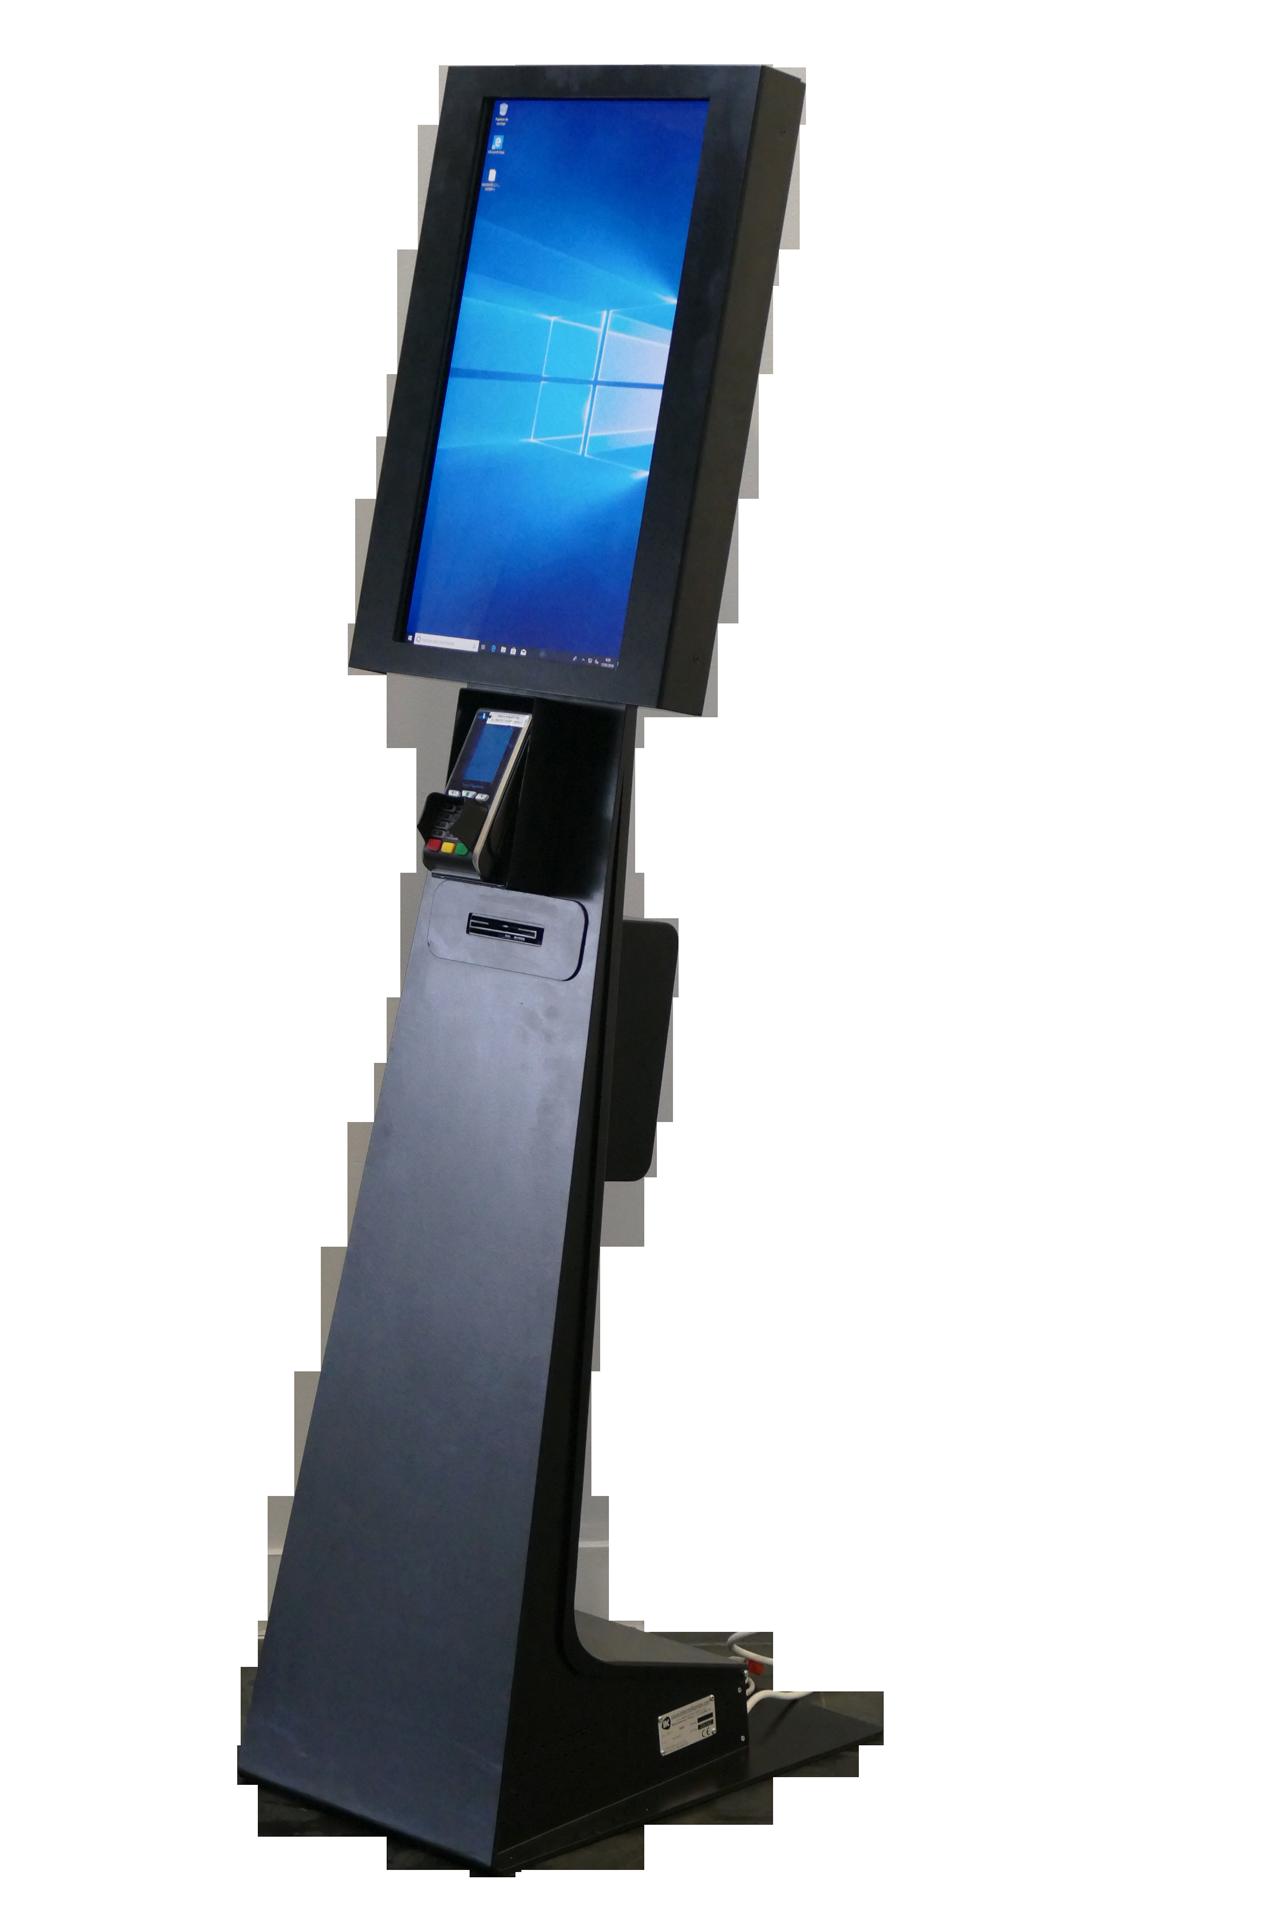 IK22 24V Dat Prt ISO - Inicio